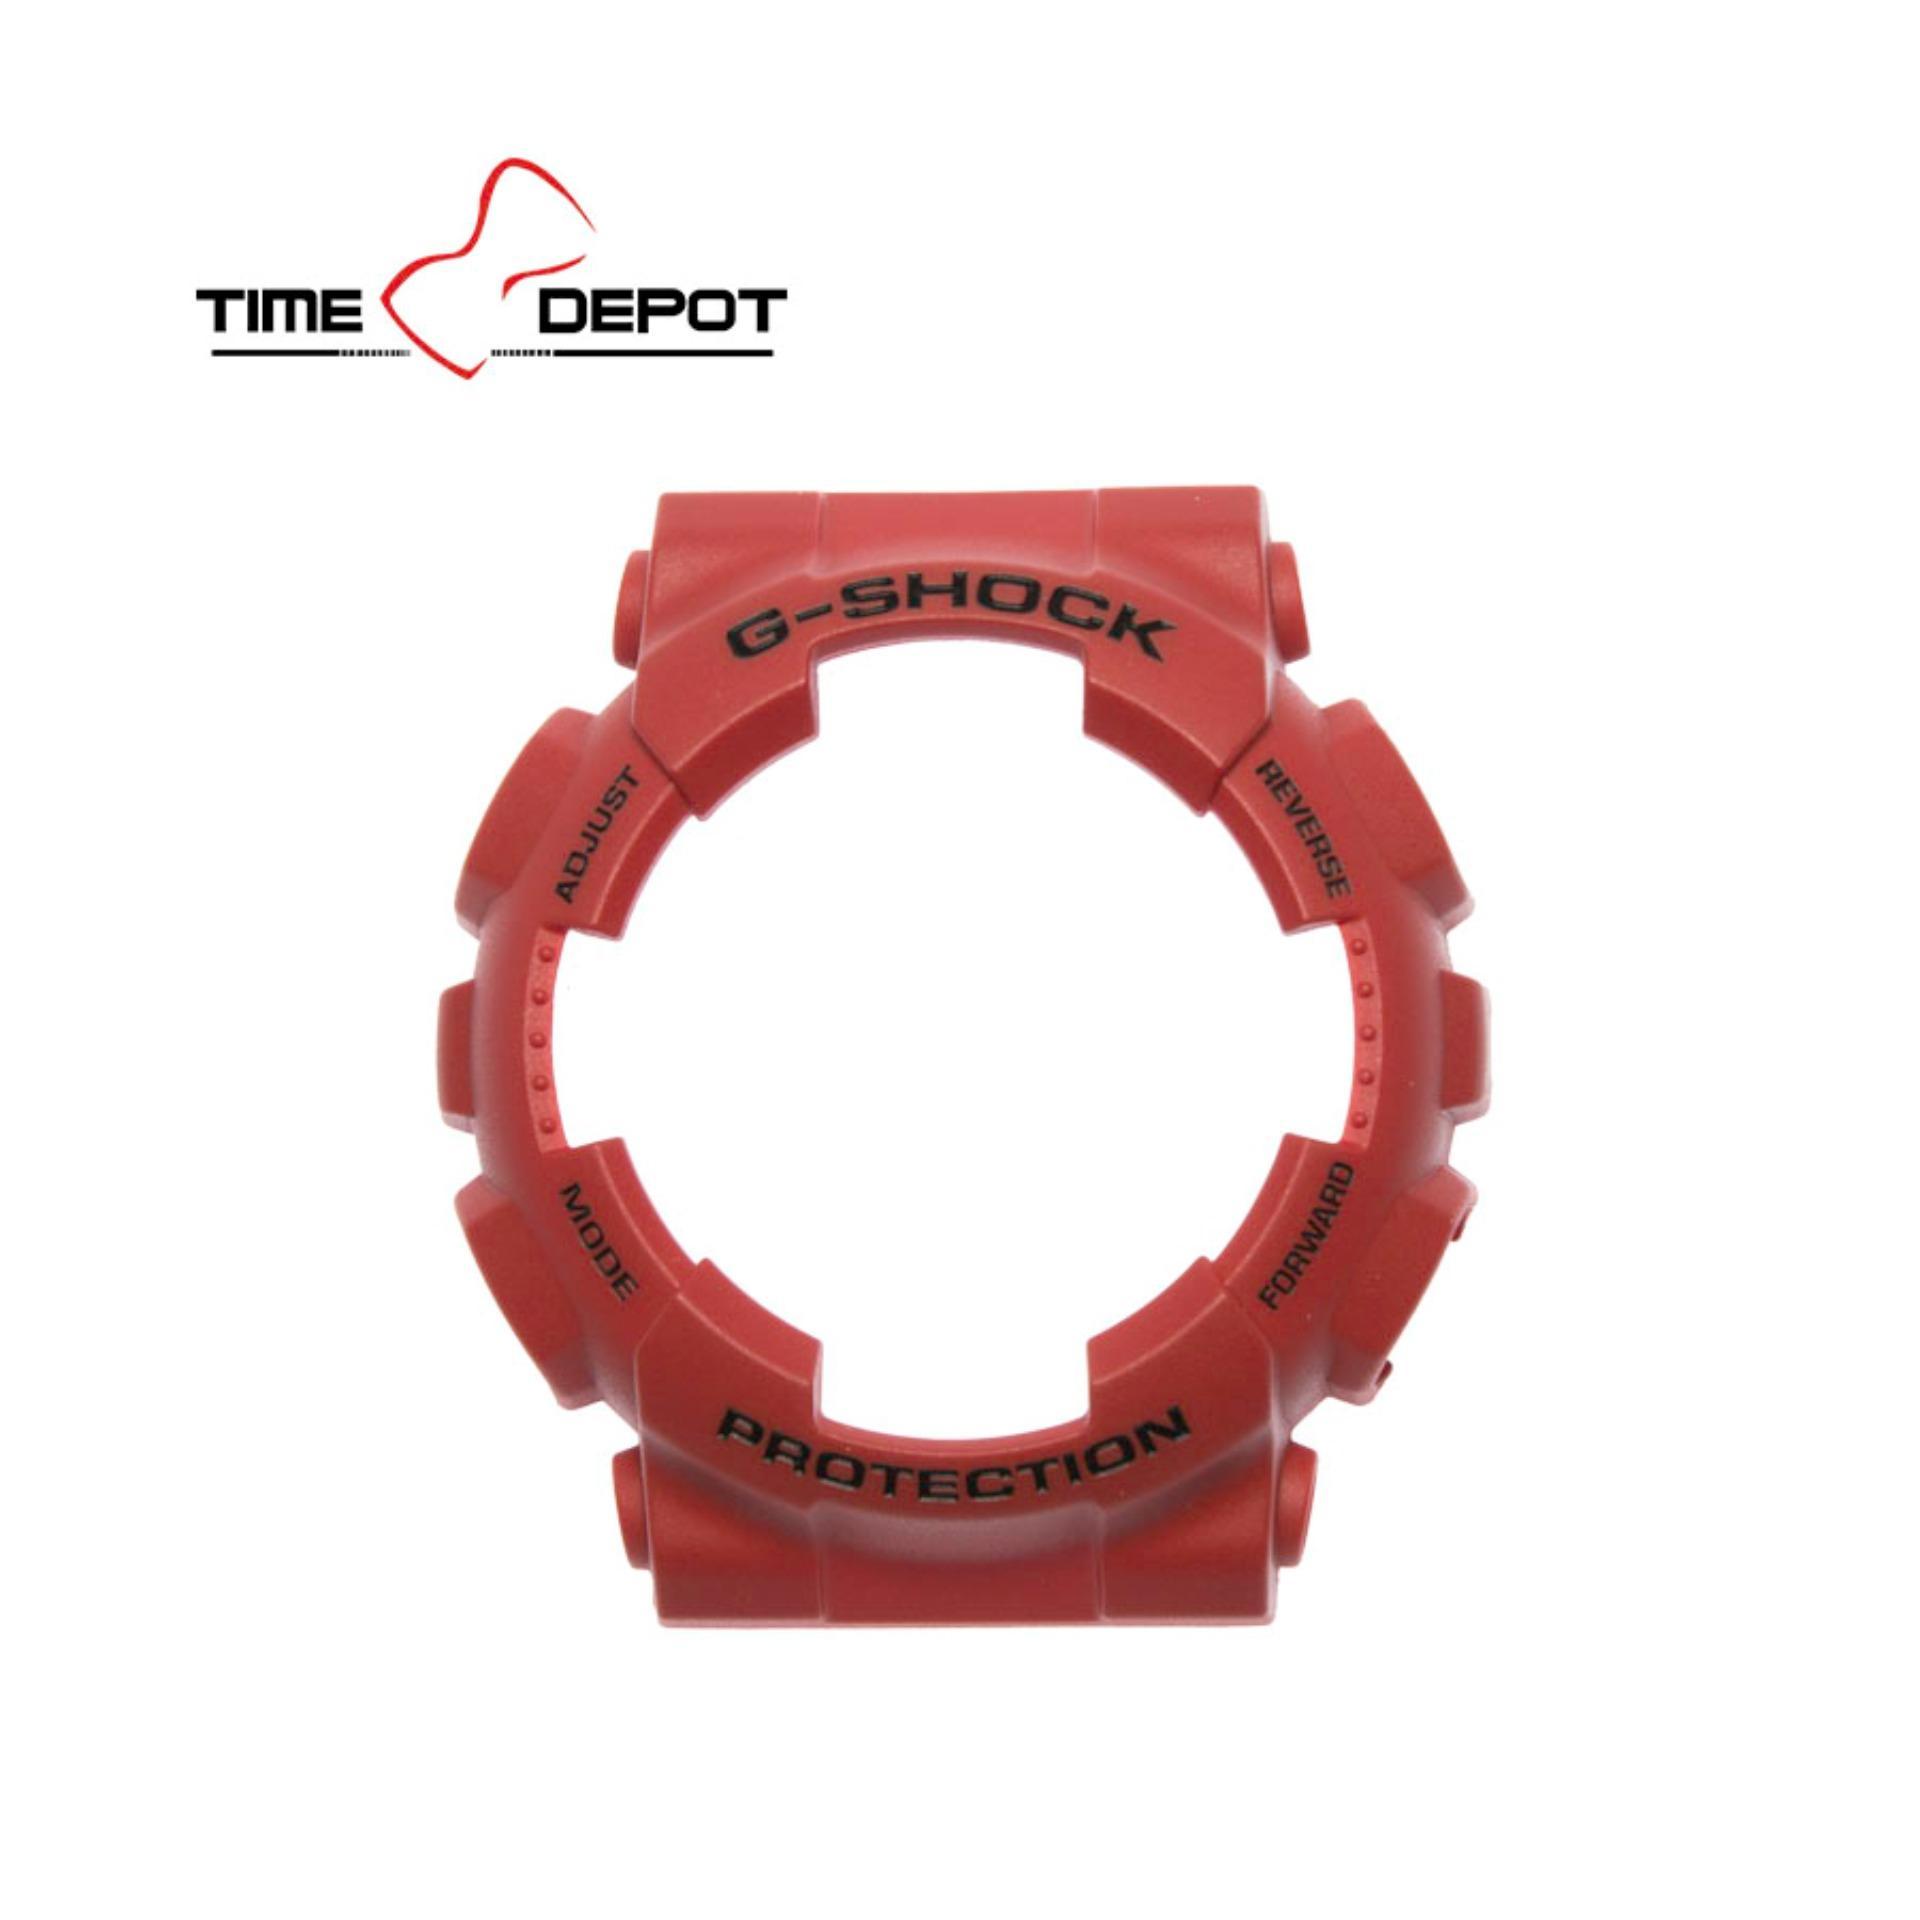 Genuine Factory Replacement Bezel 1039 5289 For Casio G Shock Ga 100b 4adr Watch Model 4a